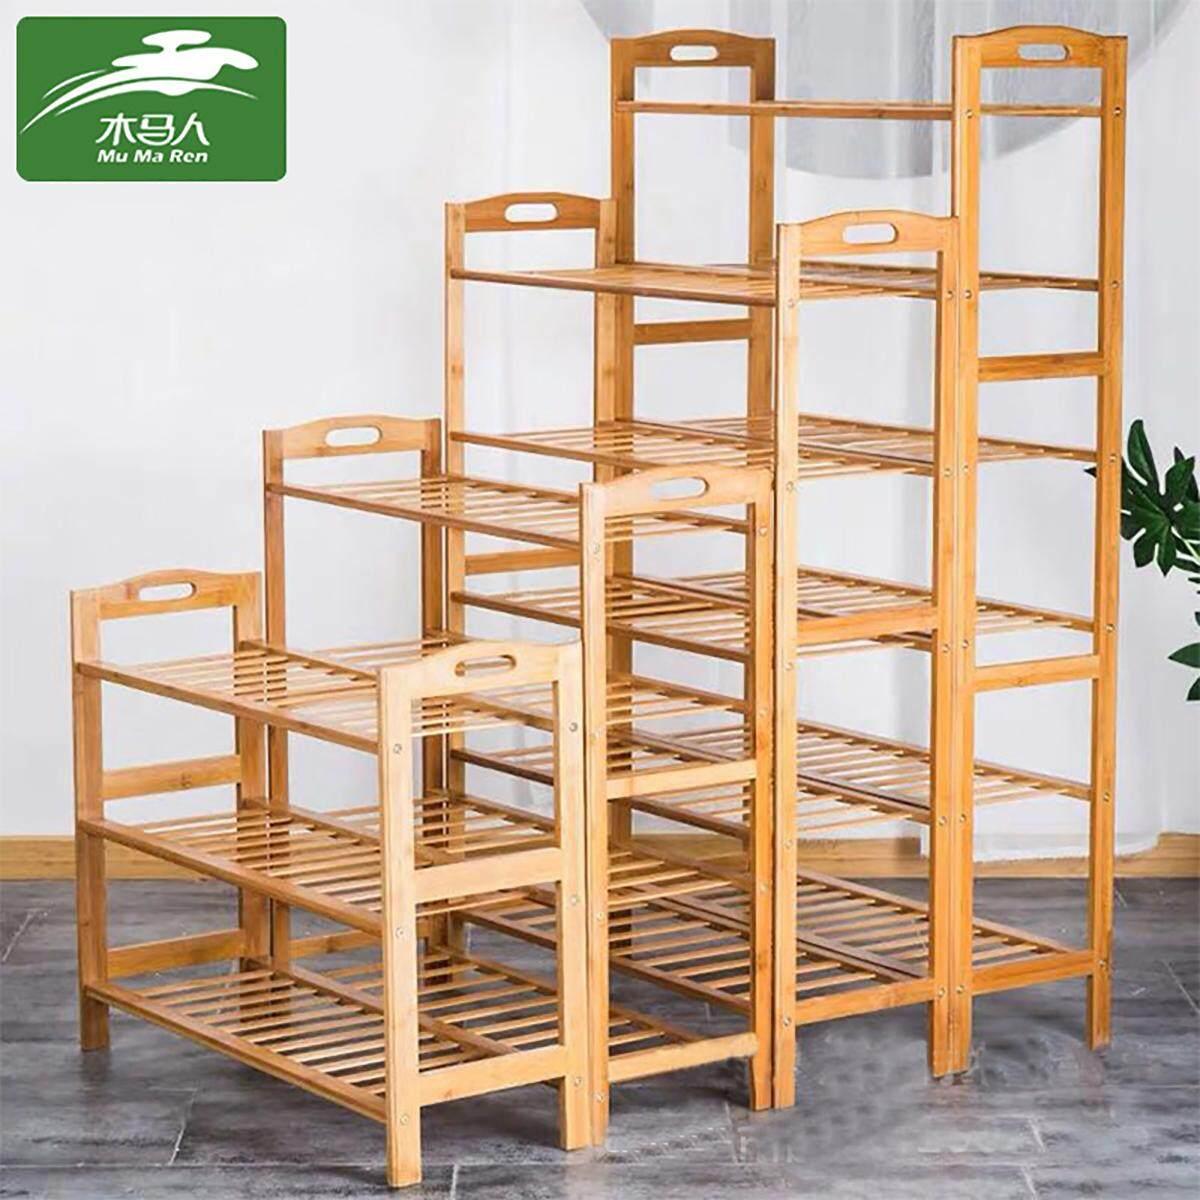 Mu Ma Ren 2/3/4/5 Tier Bamboo Shoe Rack - Home Storage Organization - Natural Durable Environmentally Friendly Organizer Renting/Decoration